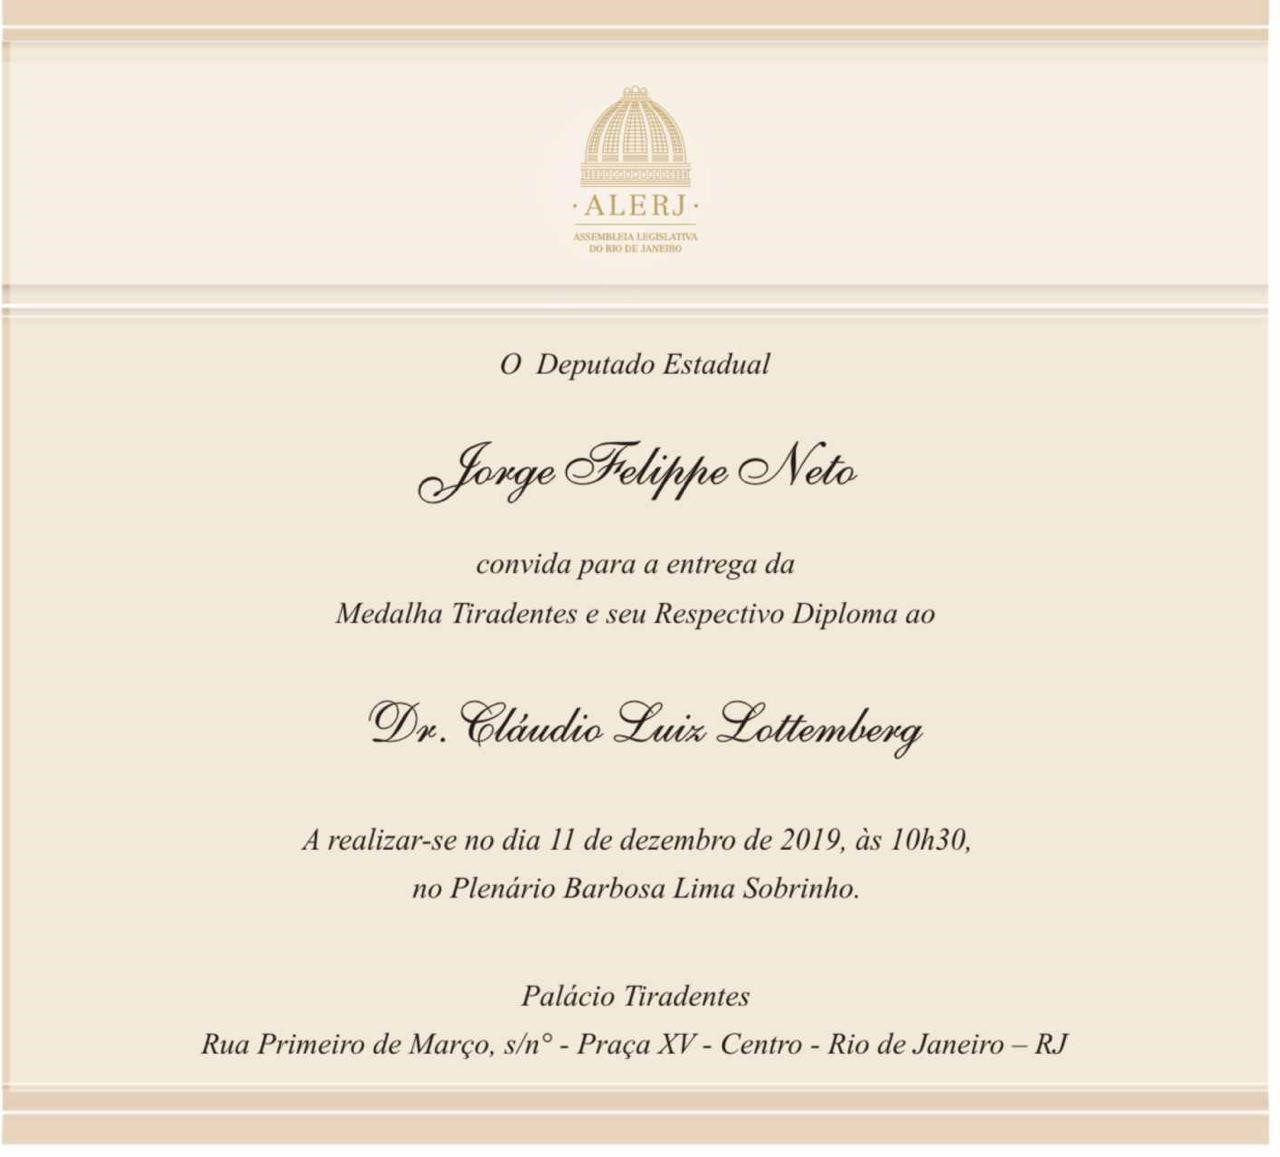 Cláudio Luiz Lottenberg Medalha Tiradentes